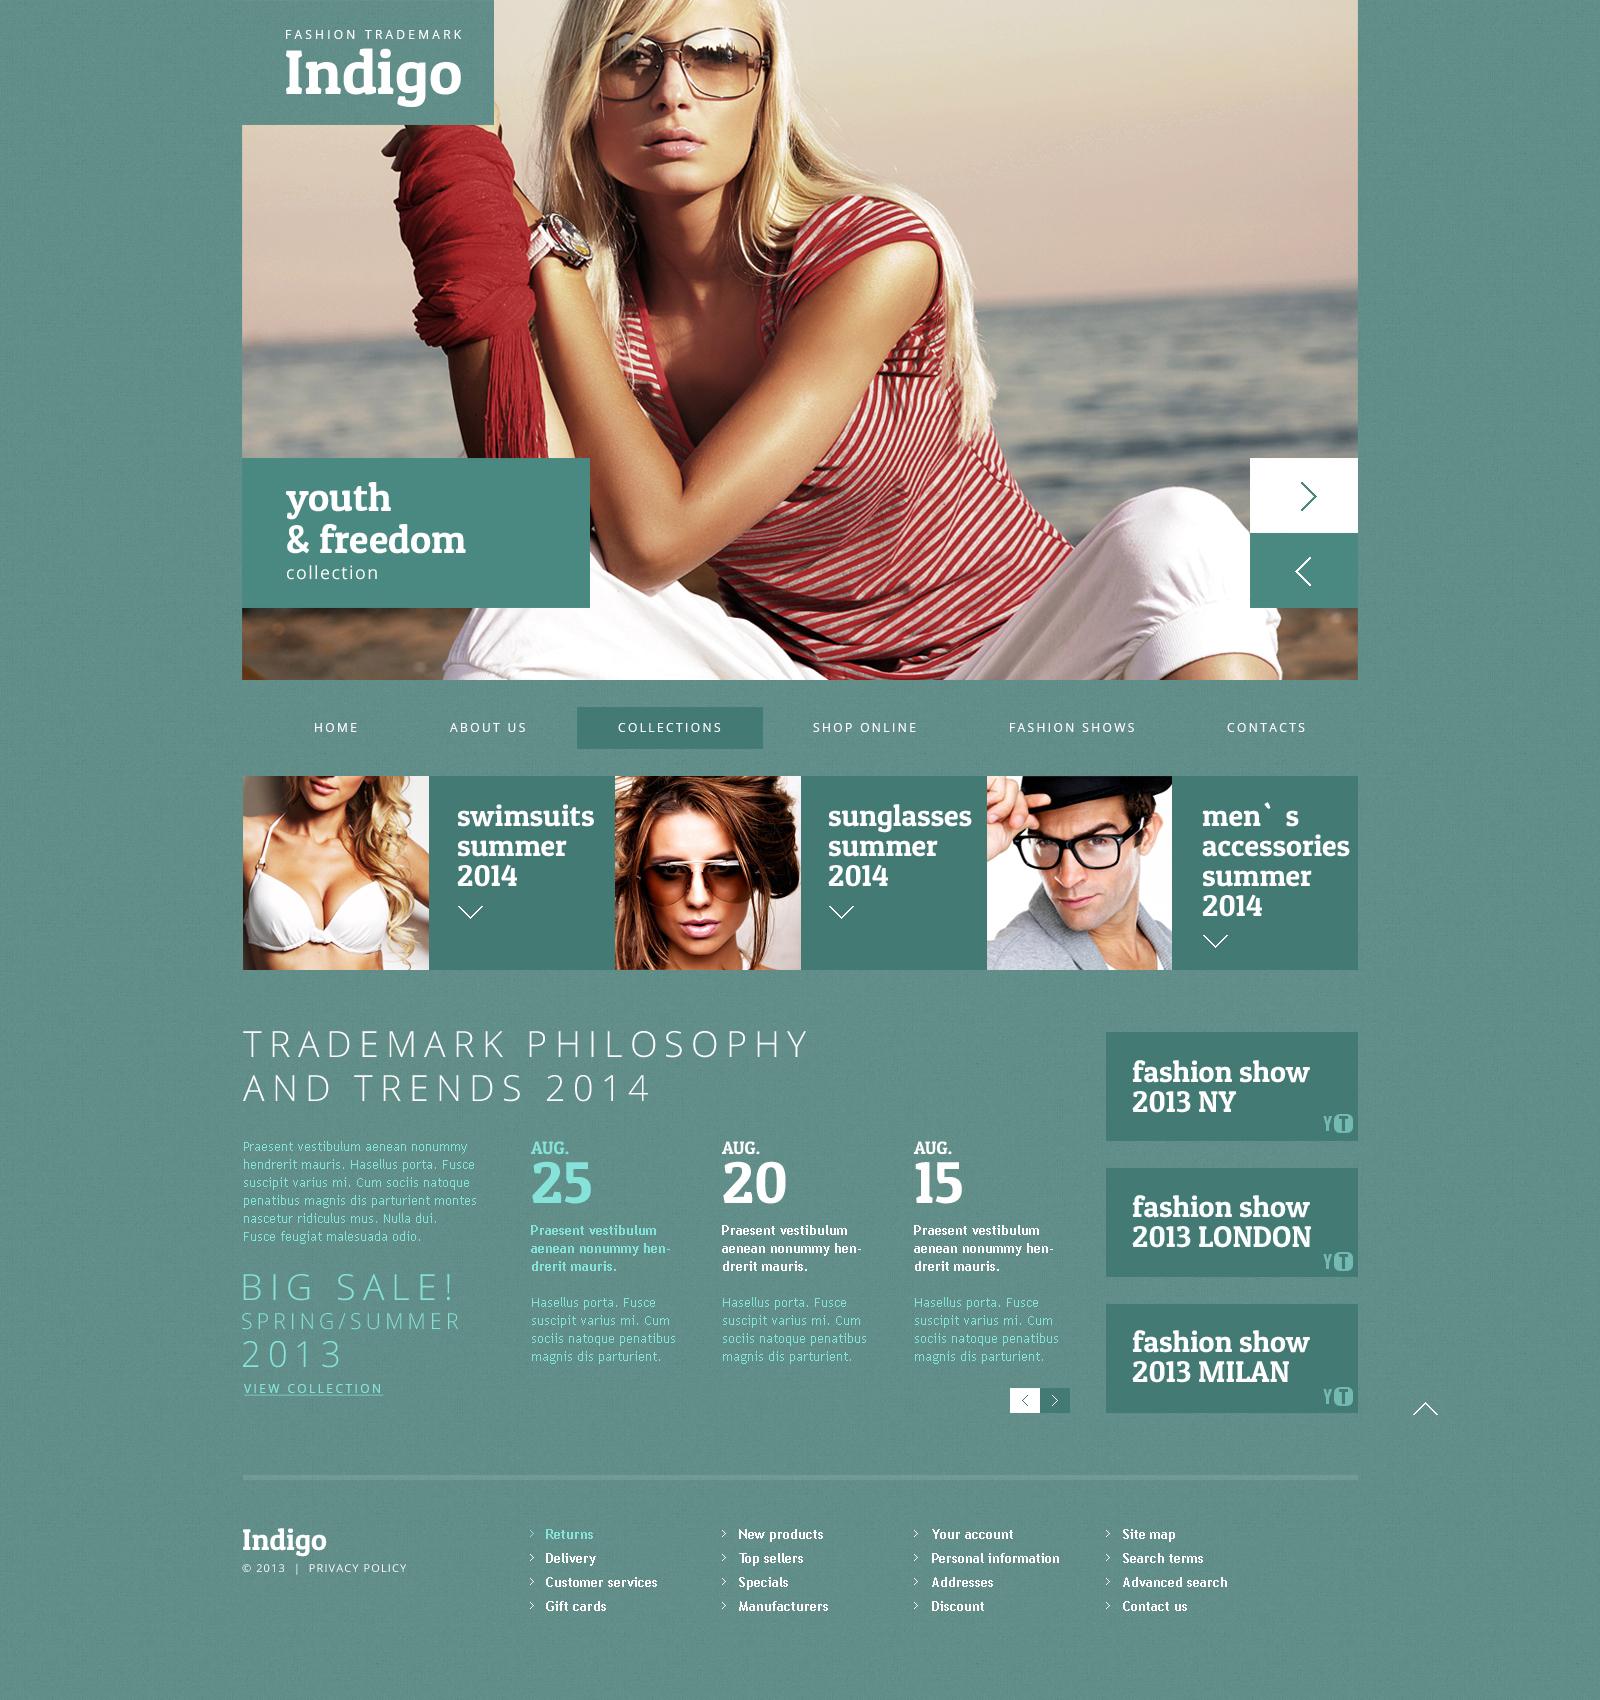 Wunderbar Blogger Mode Vorlagen Galerie - Entry Level Resume ...